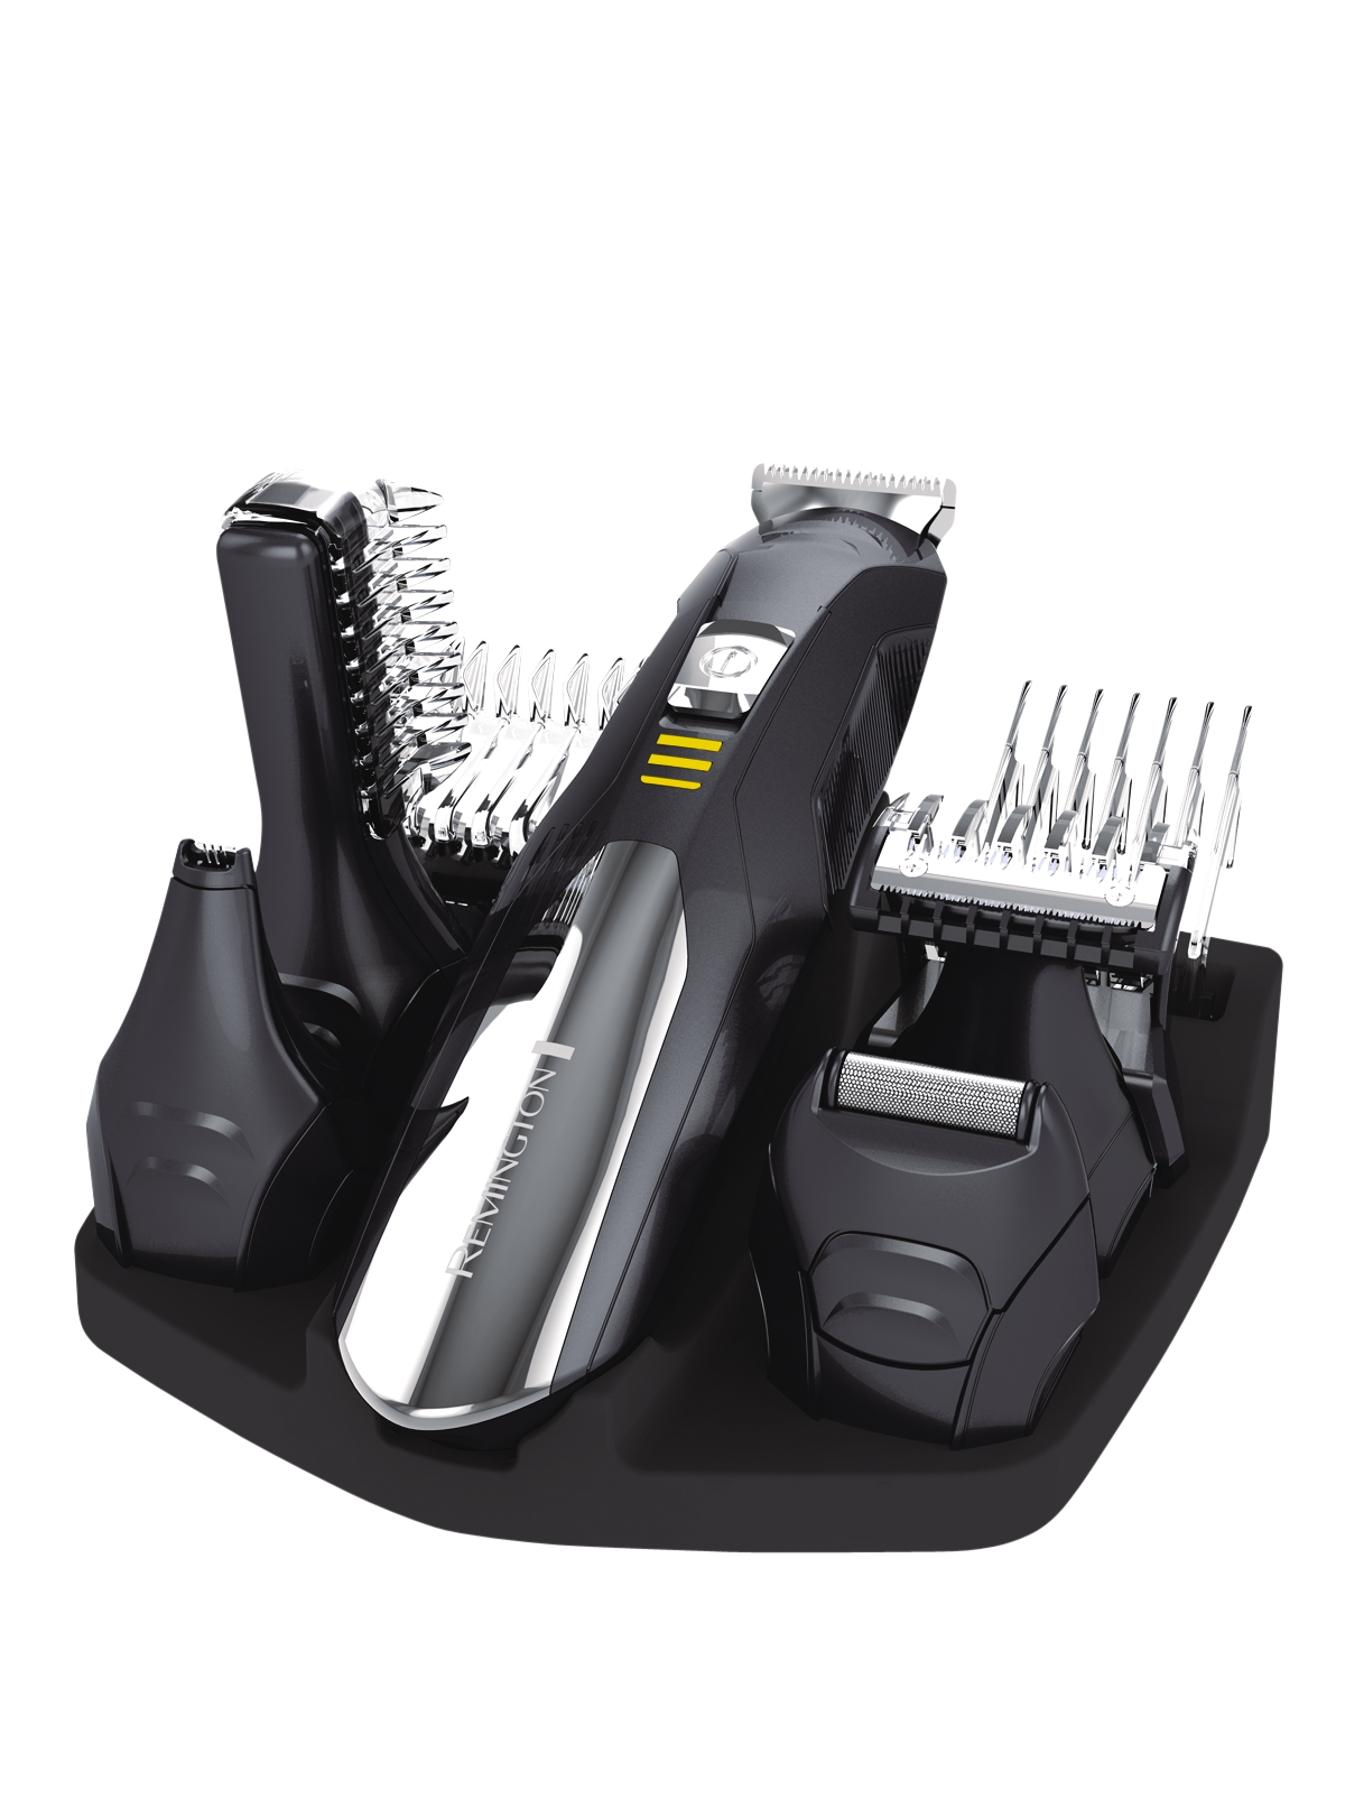 Remington PG6050 Pioneer Personal Grooming System & FREE Lynx Gift Set*